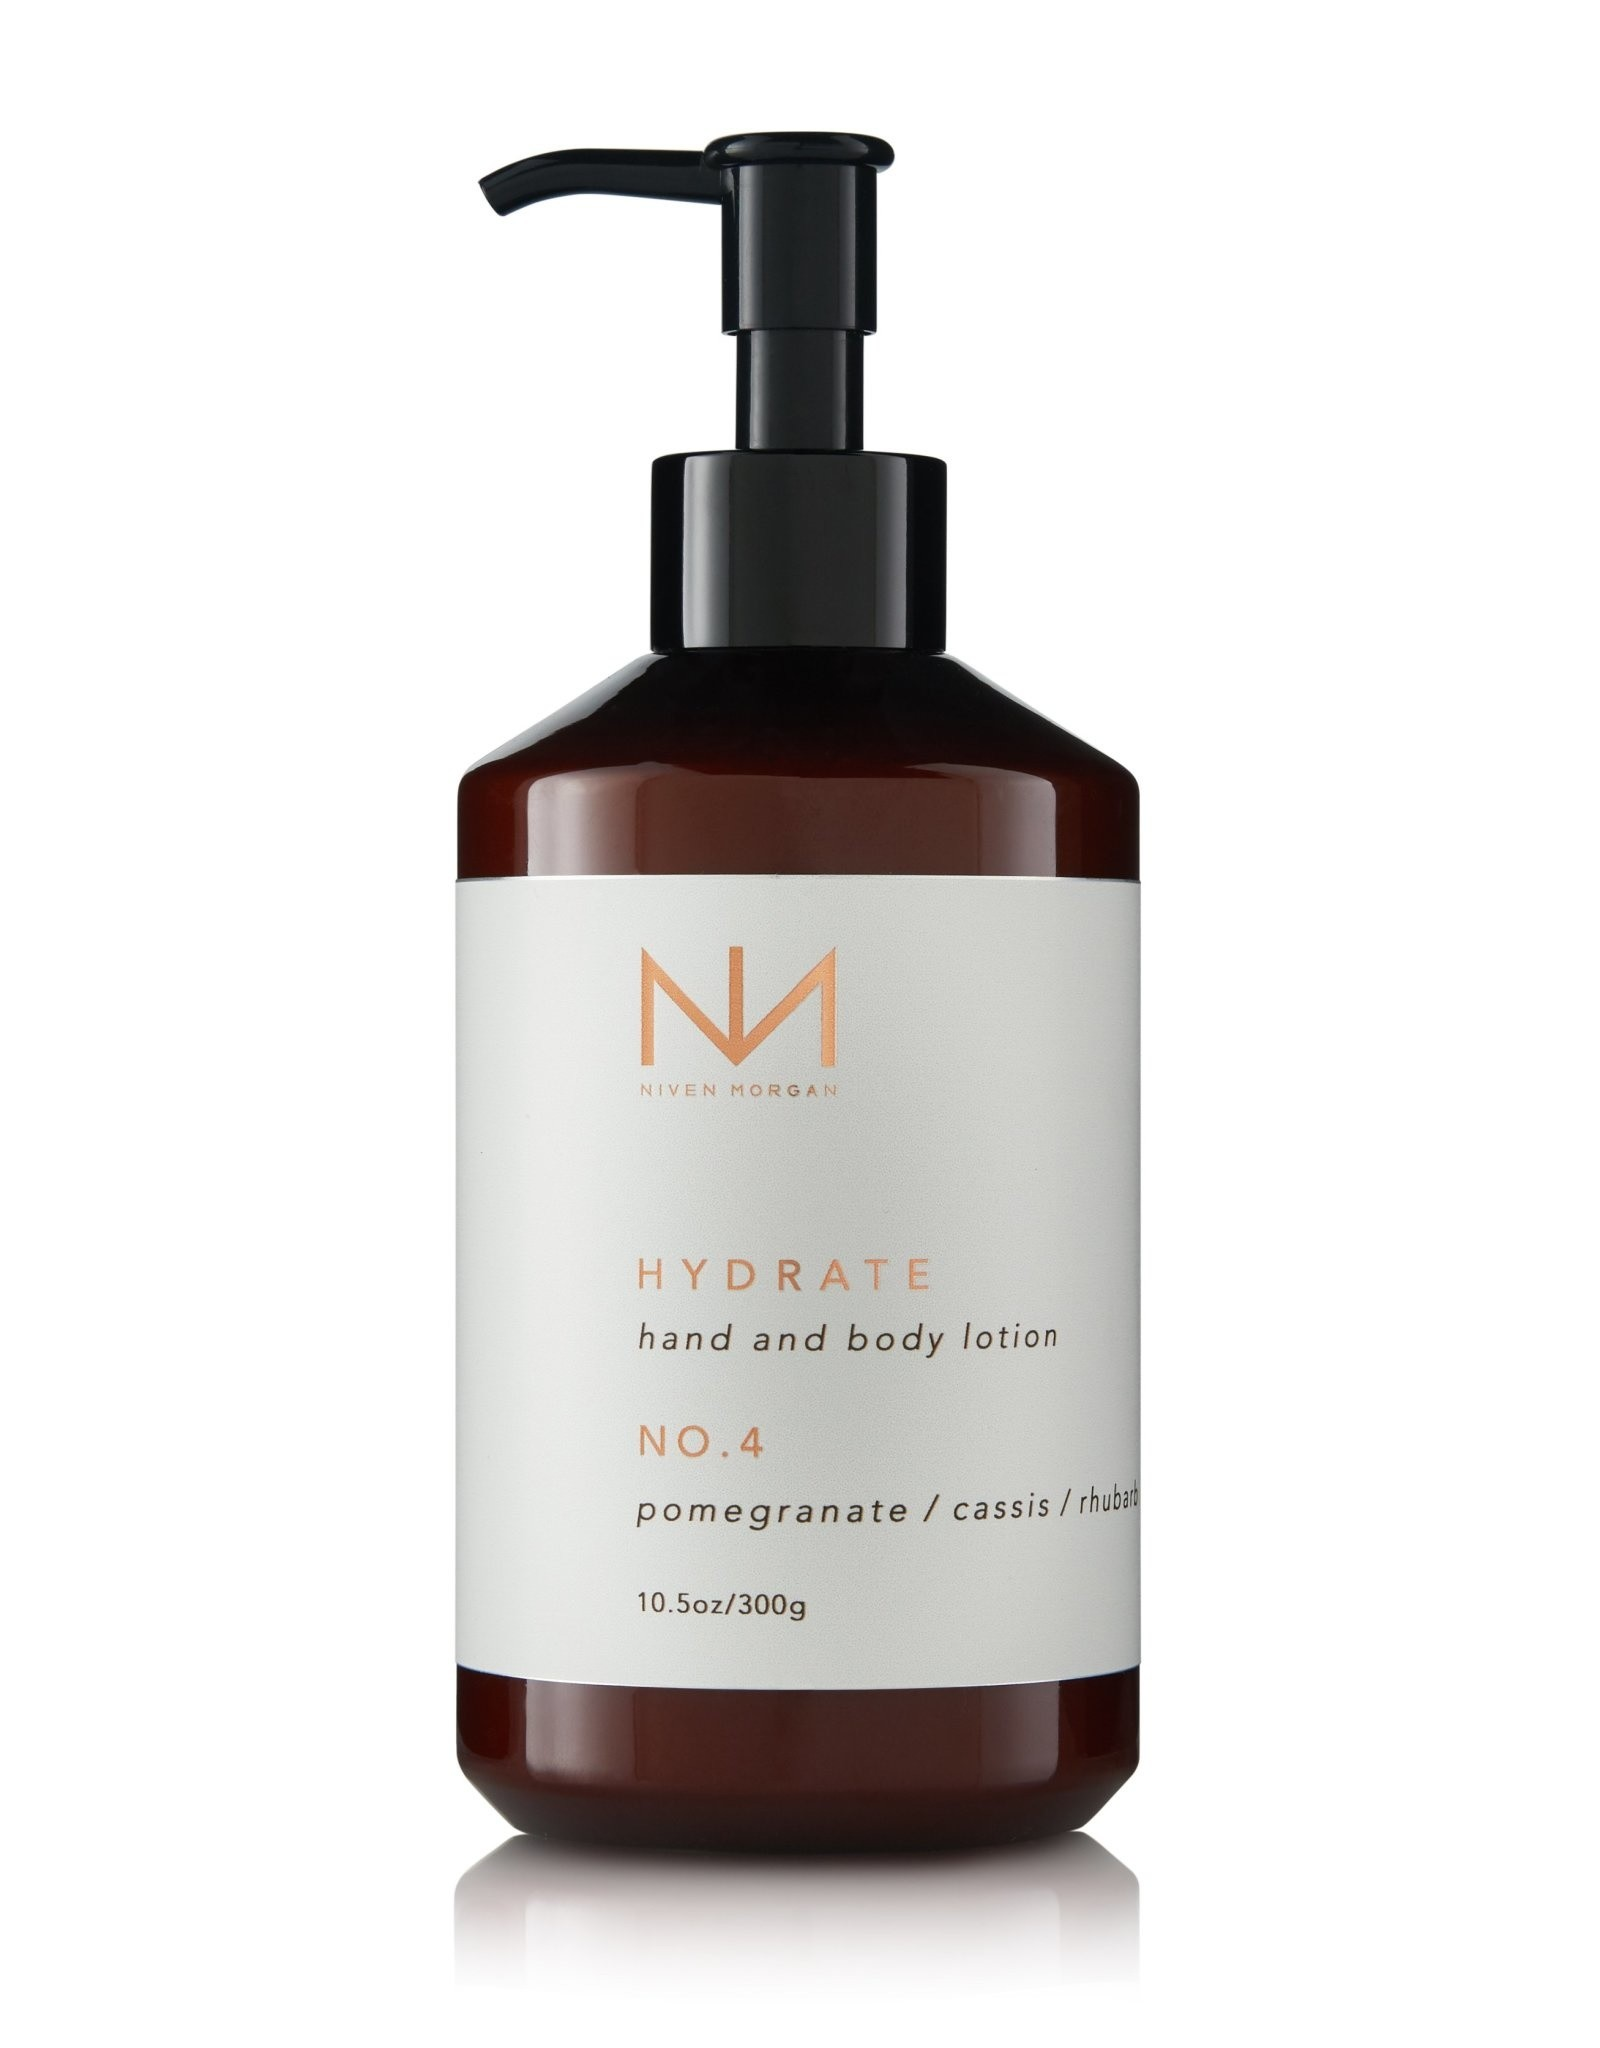 NM Hydrate Hand & Body No. 4